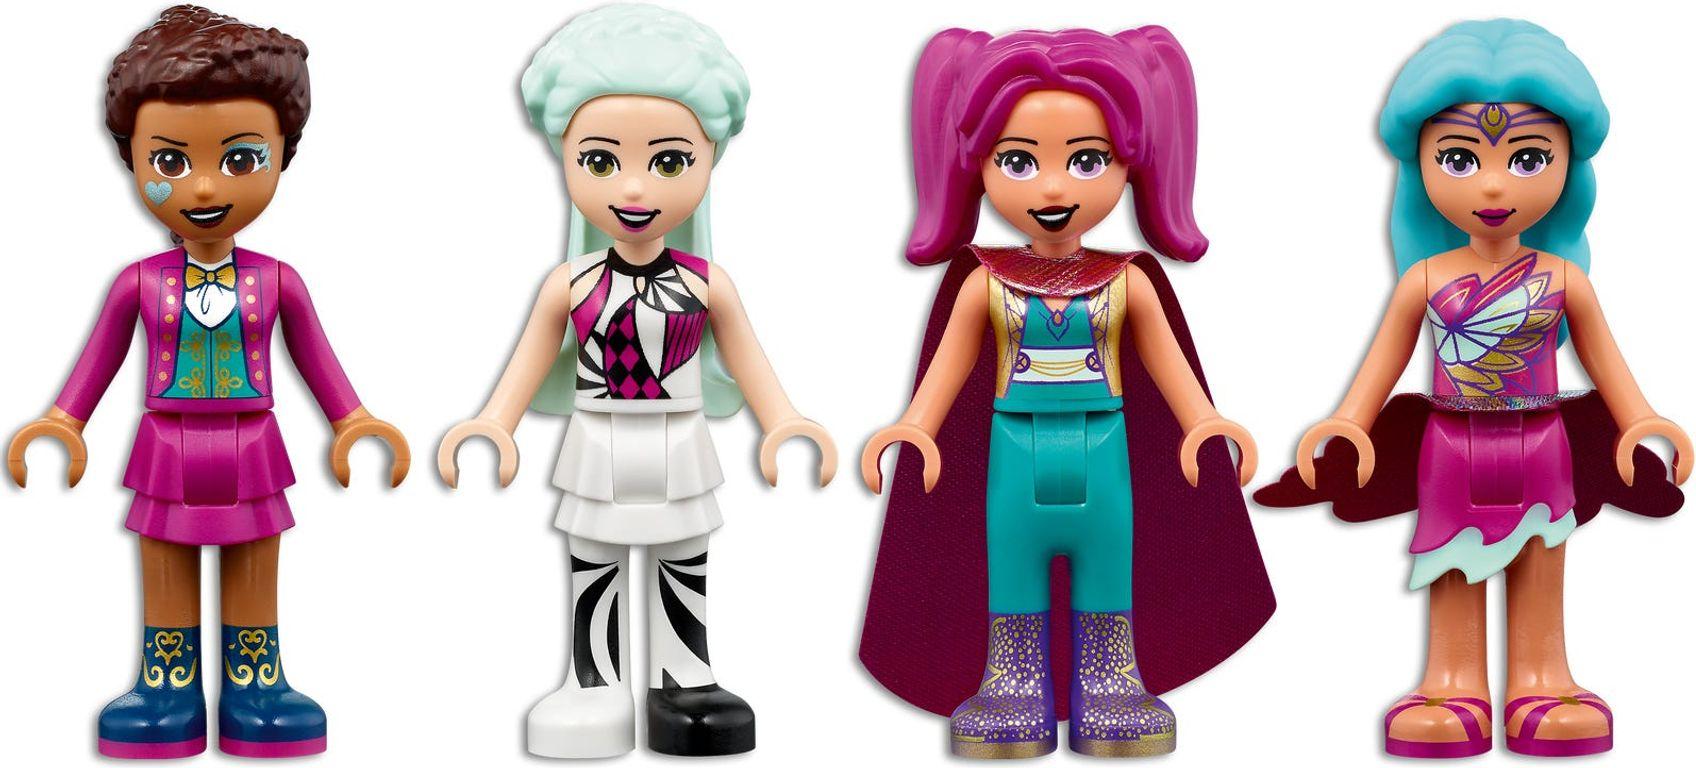 LEGO® Friends Magical Funfair Roller Coaster minifigures